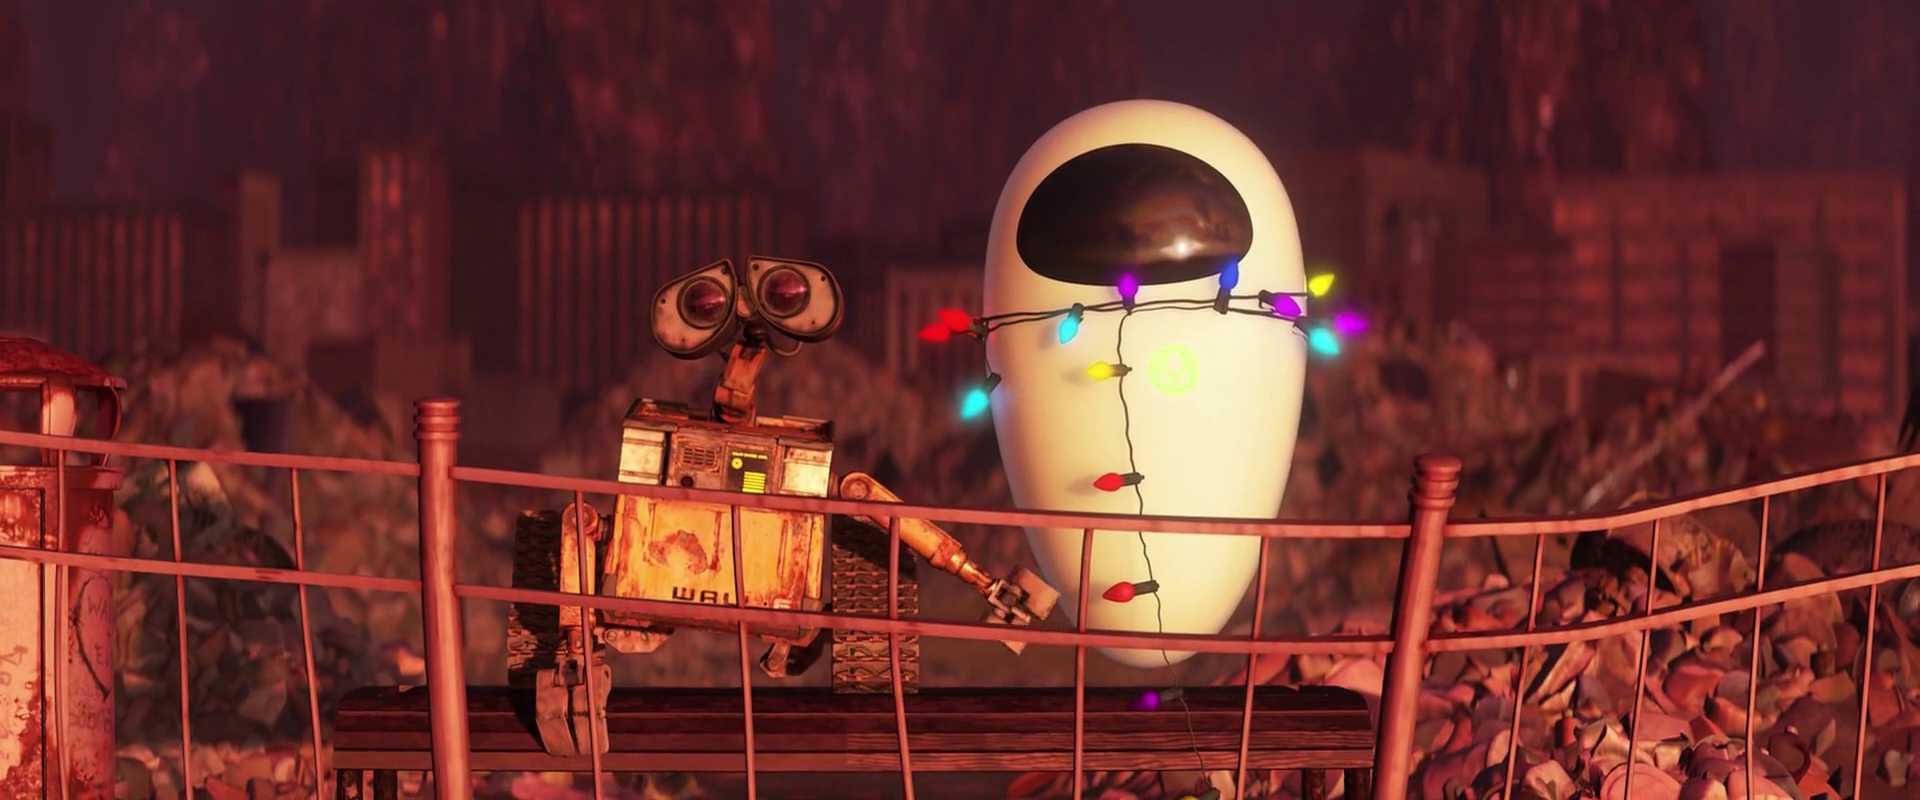 WALL-E snapshot 3